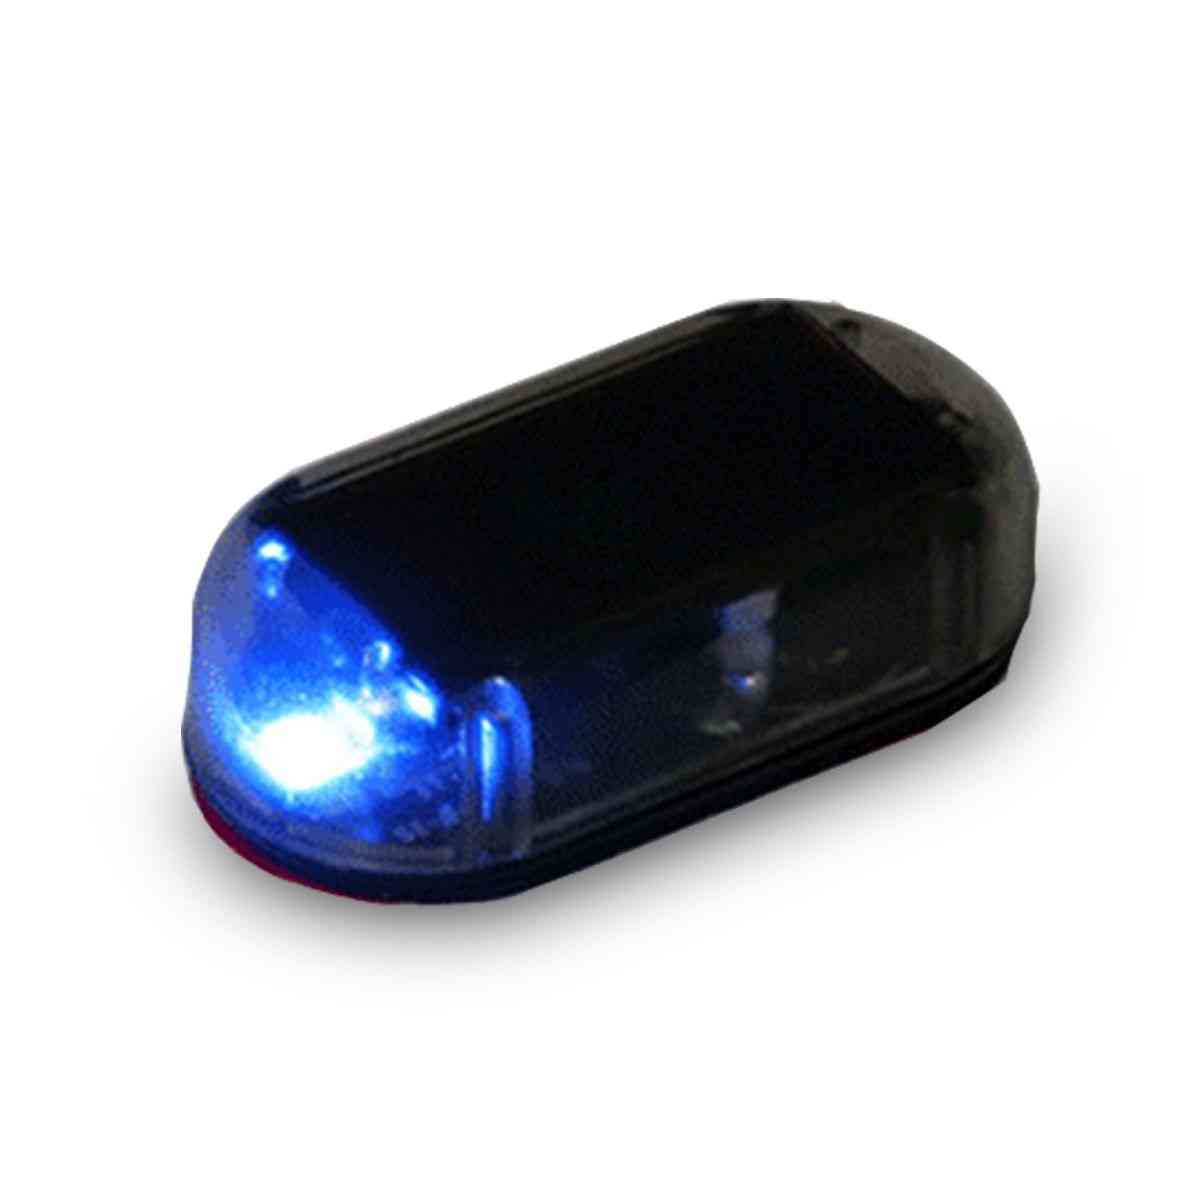 All Car Alarm Lamp Usb Wireless Warning Anti-theft Light